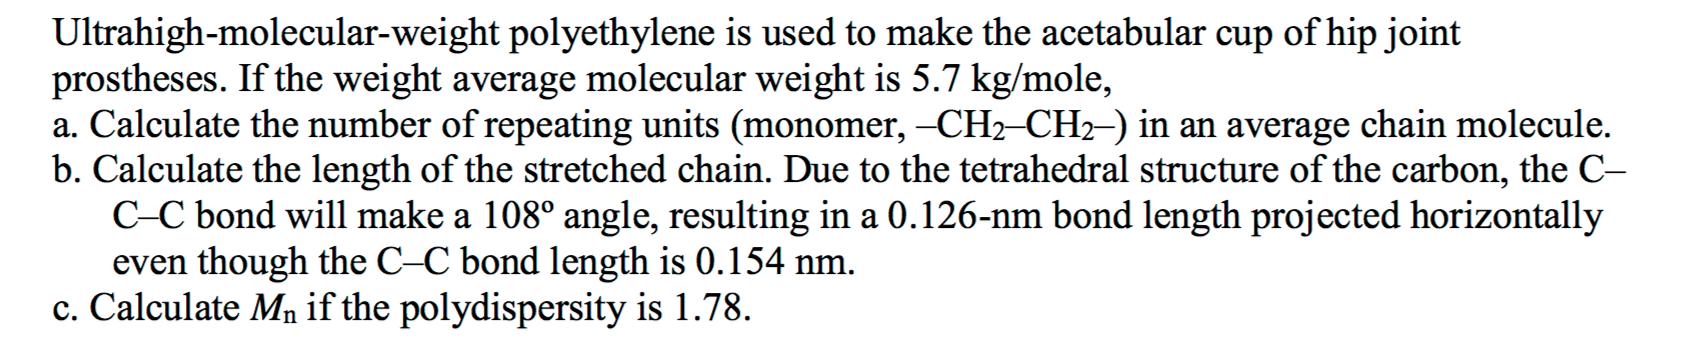 high molecular weight polyethylene essay #healthy essay about healthy ultra high molecular weight polyethylene synthesis essay laerd dissertation purposive sampling in quantitative research narrative.